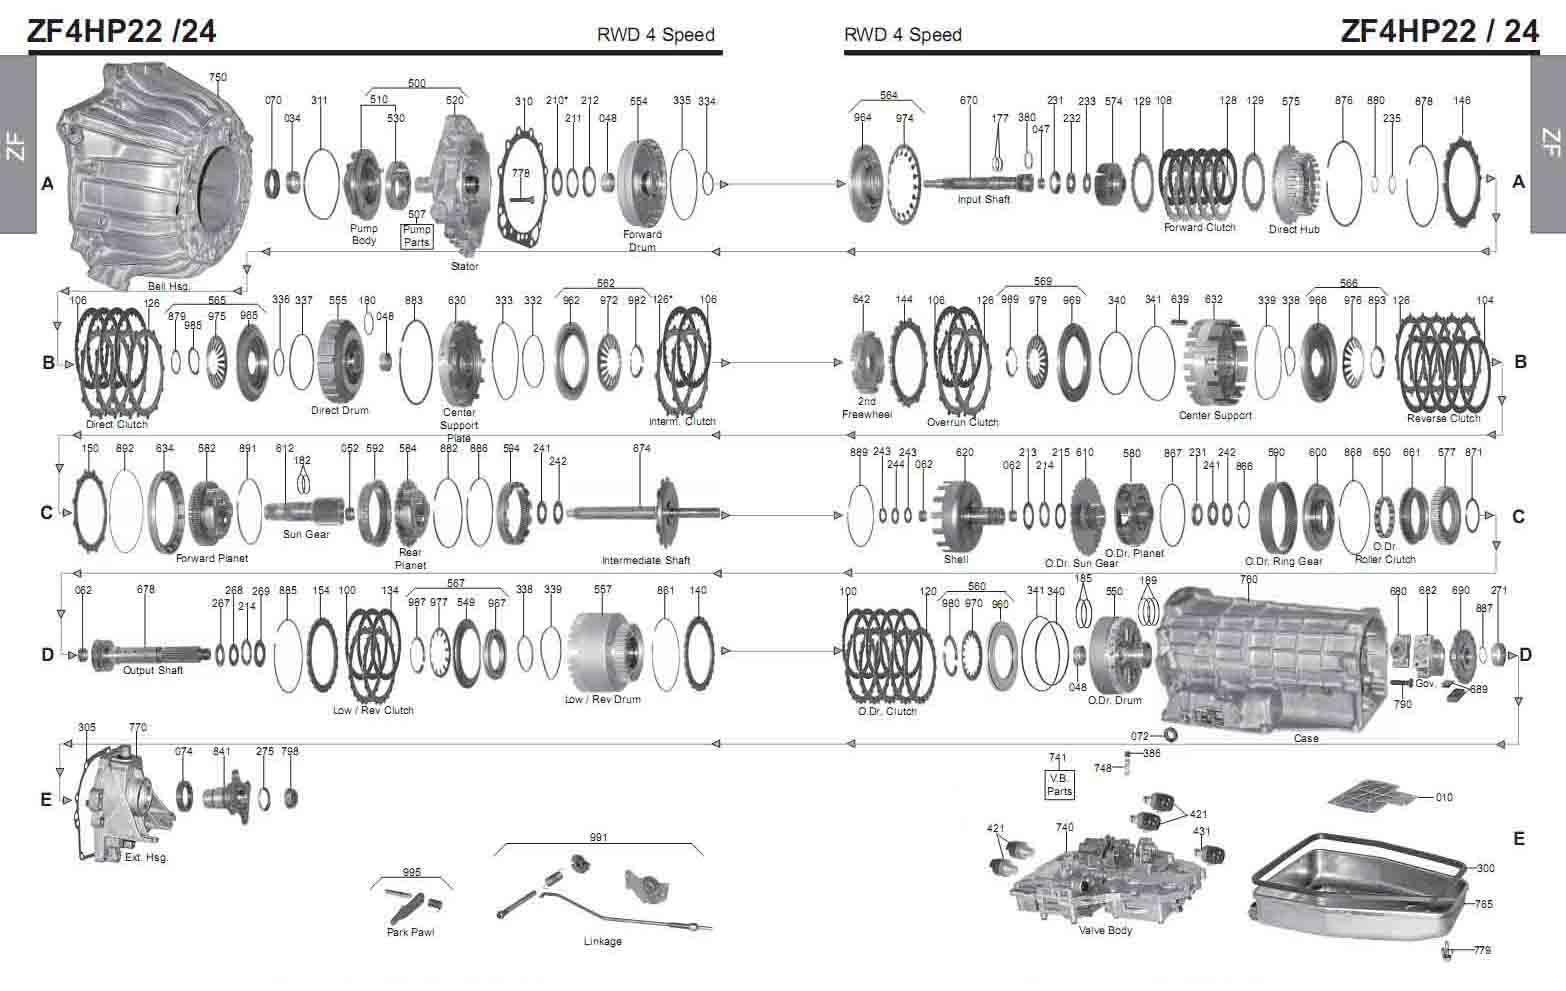 Transmission repair manuals ZF 4HP22 / 4HP24